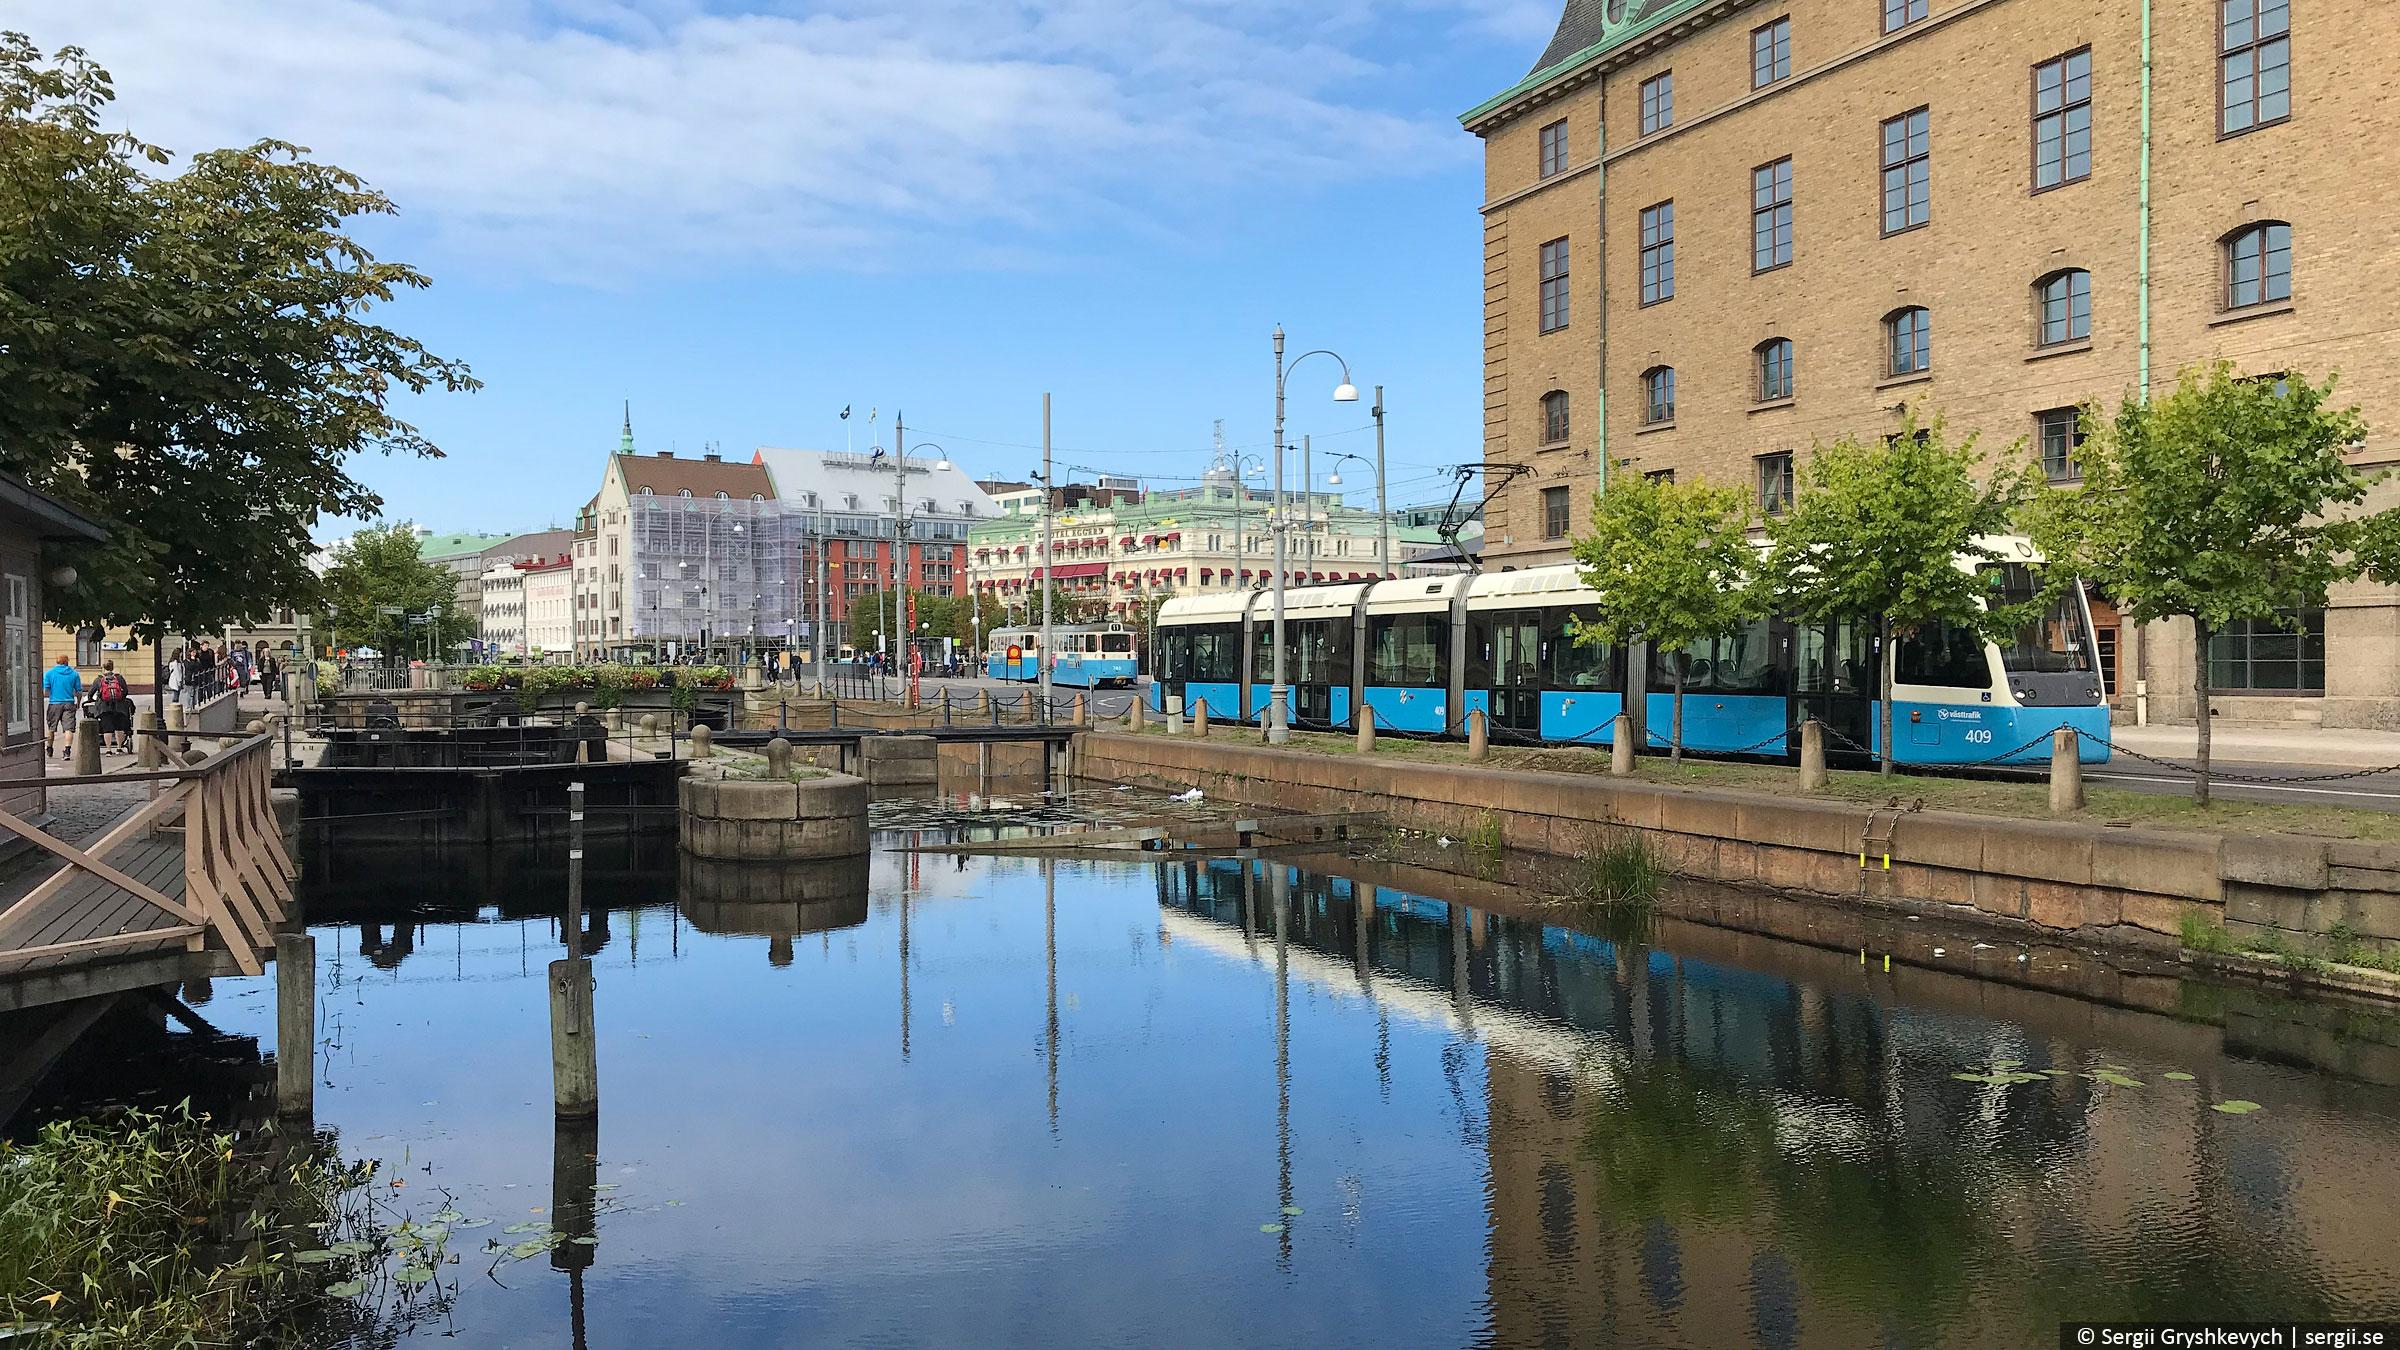 göteborg-ghotenburg-sweden-2018-4